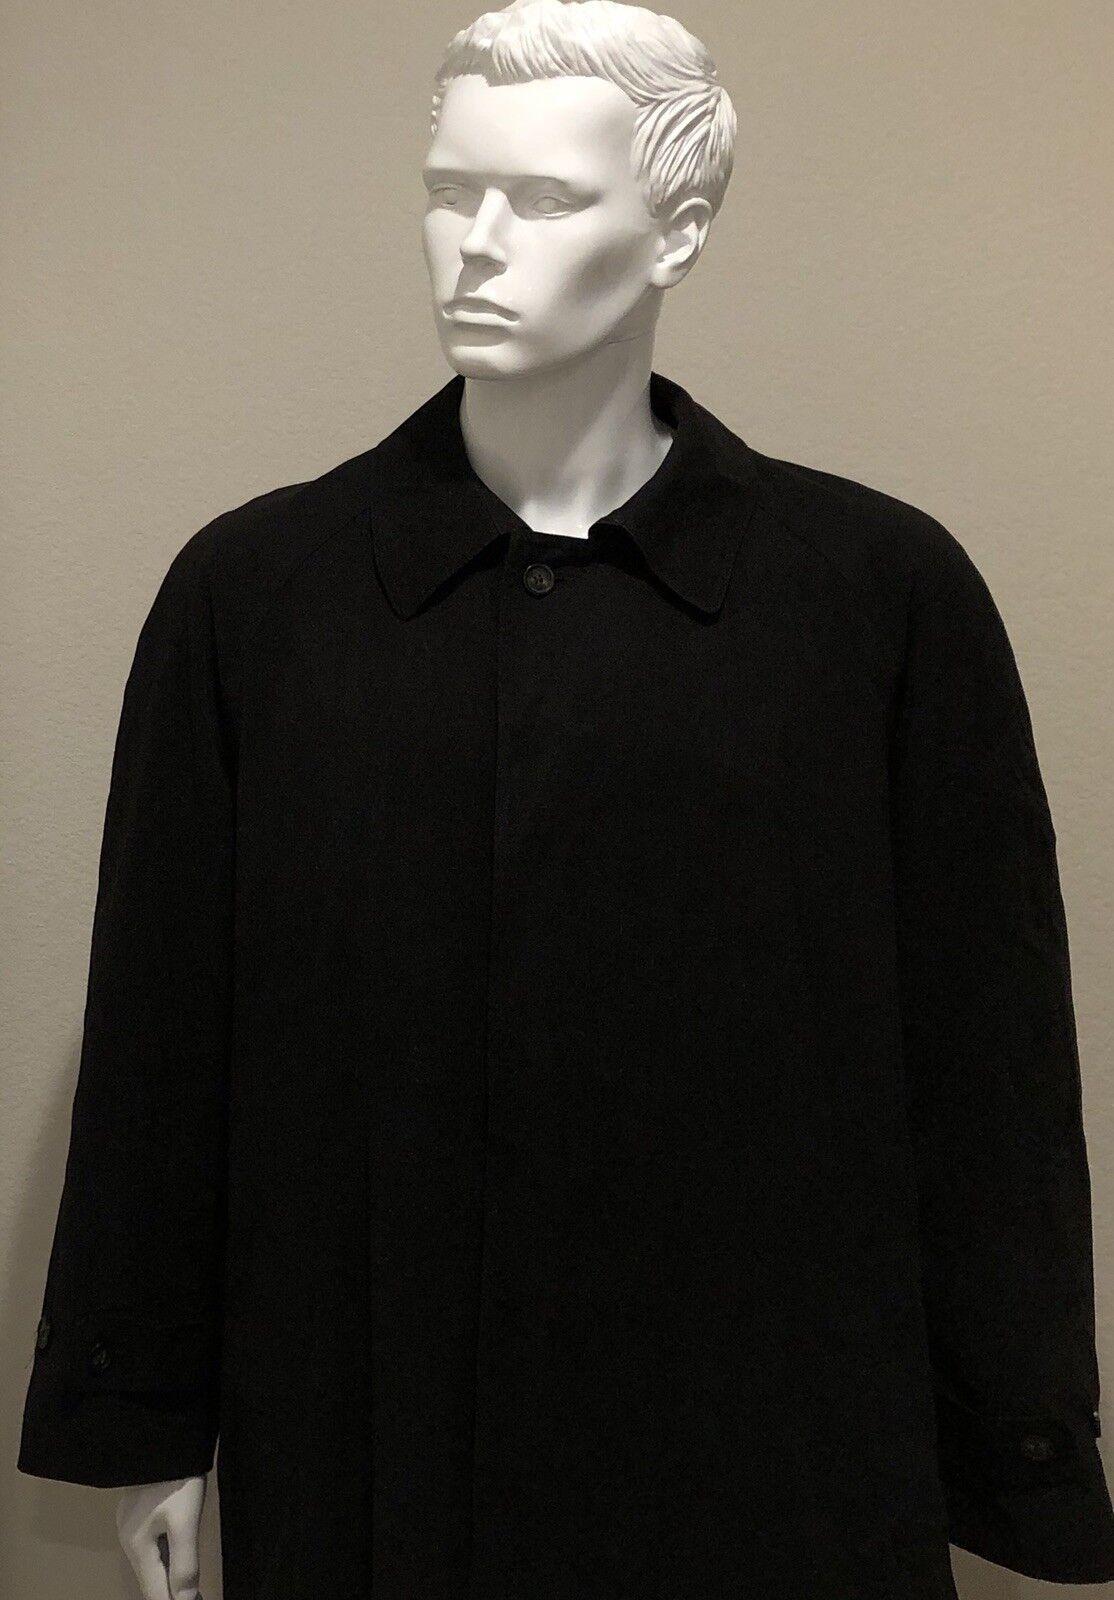 RALPH LAUREN POLO UNIVERSITY CLUB Men's Trench Coat Overcoat Double Breasted 44R